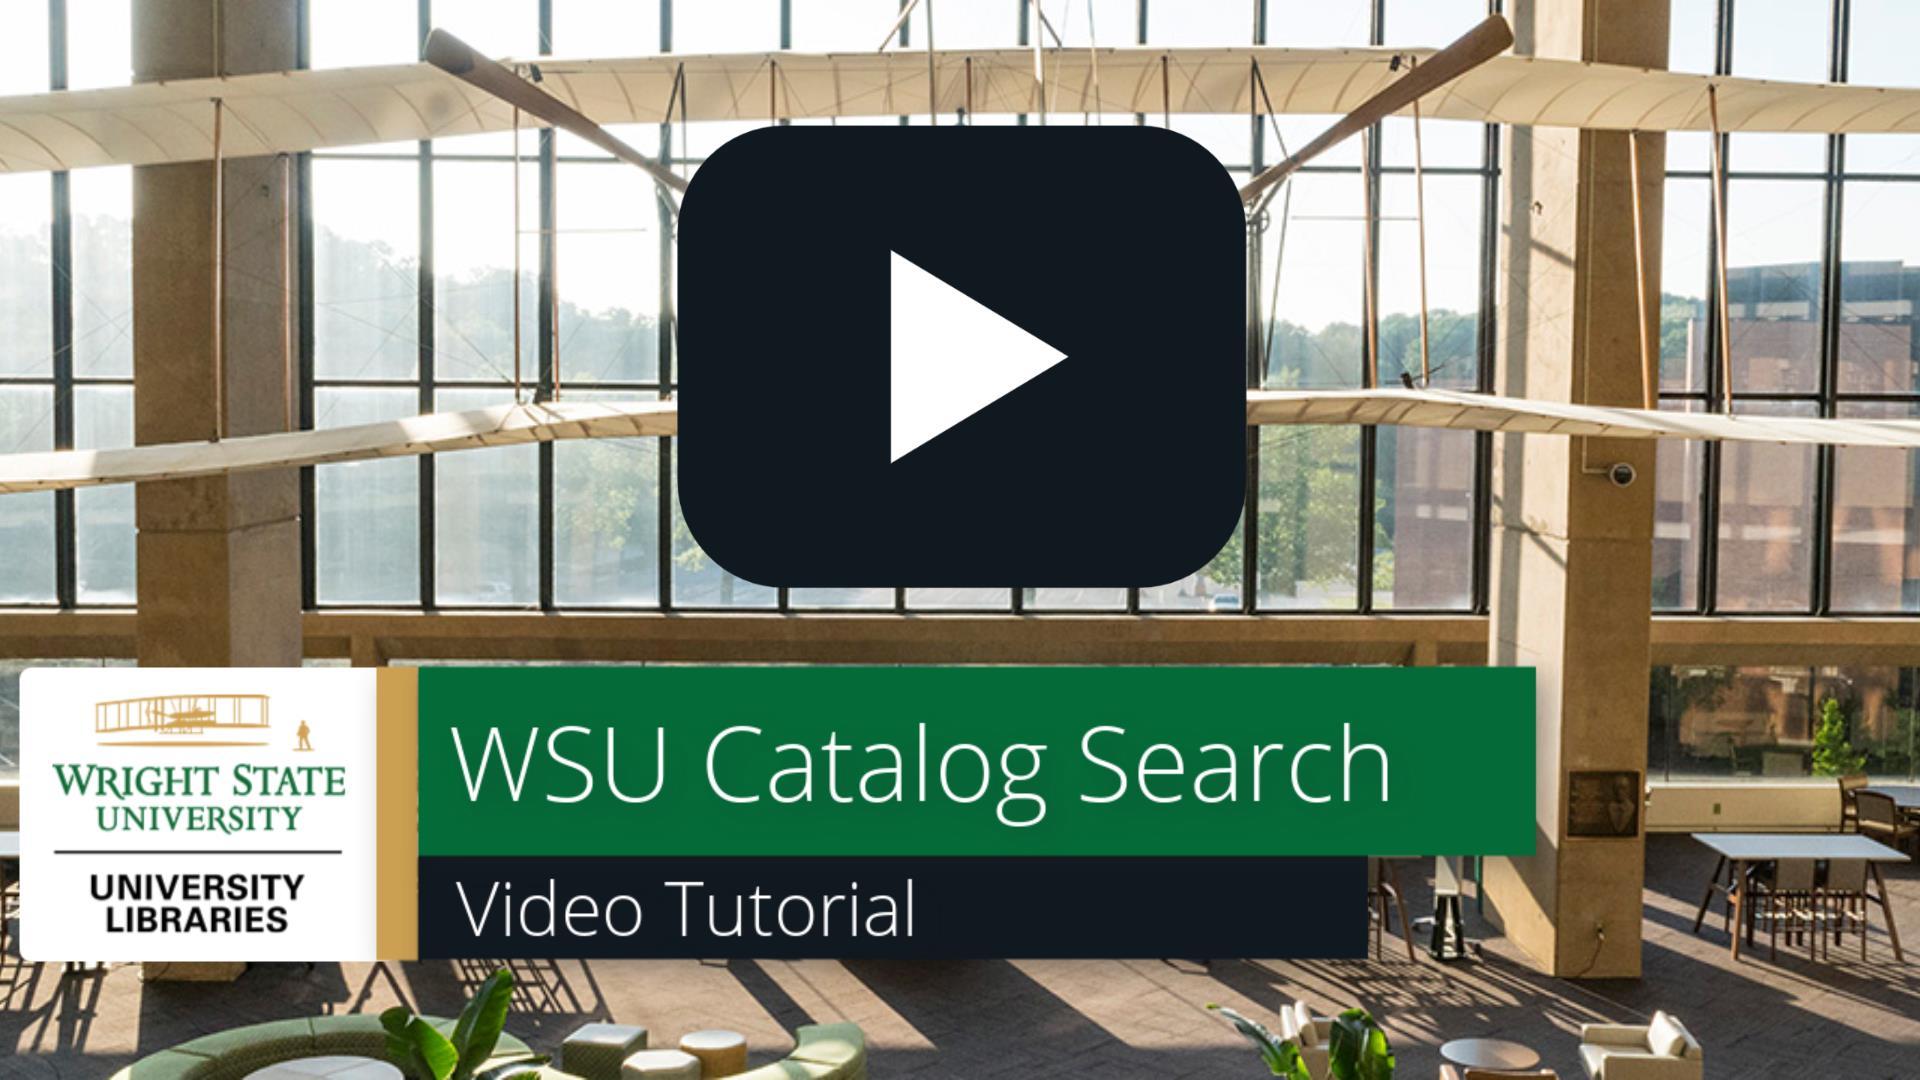 WSU Catalog Search: Video Tutorial